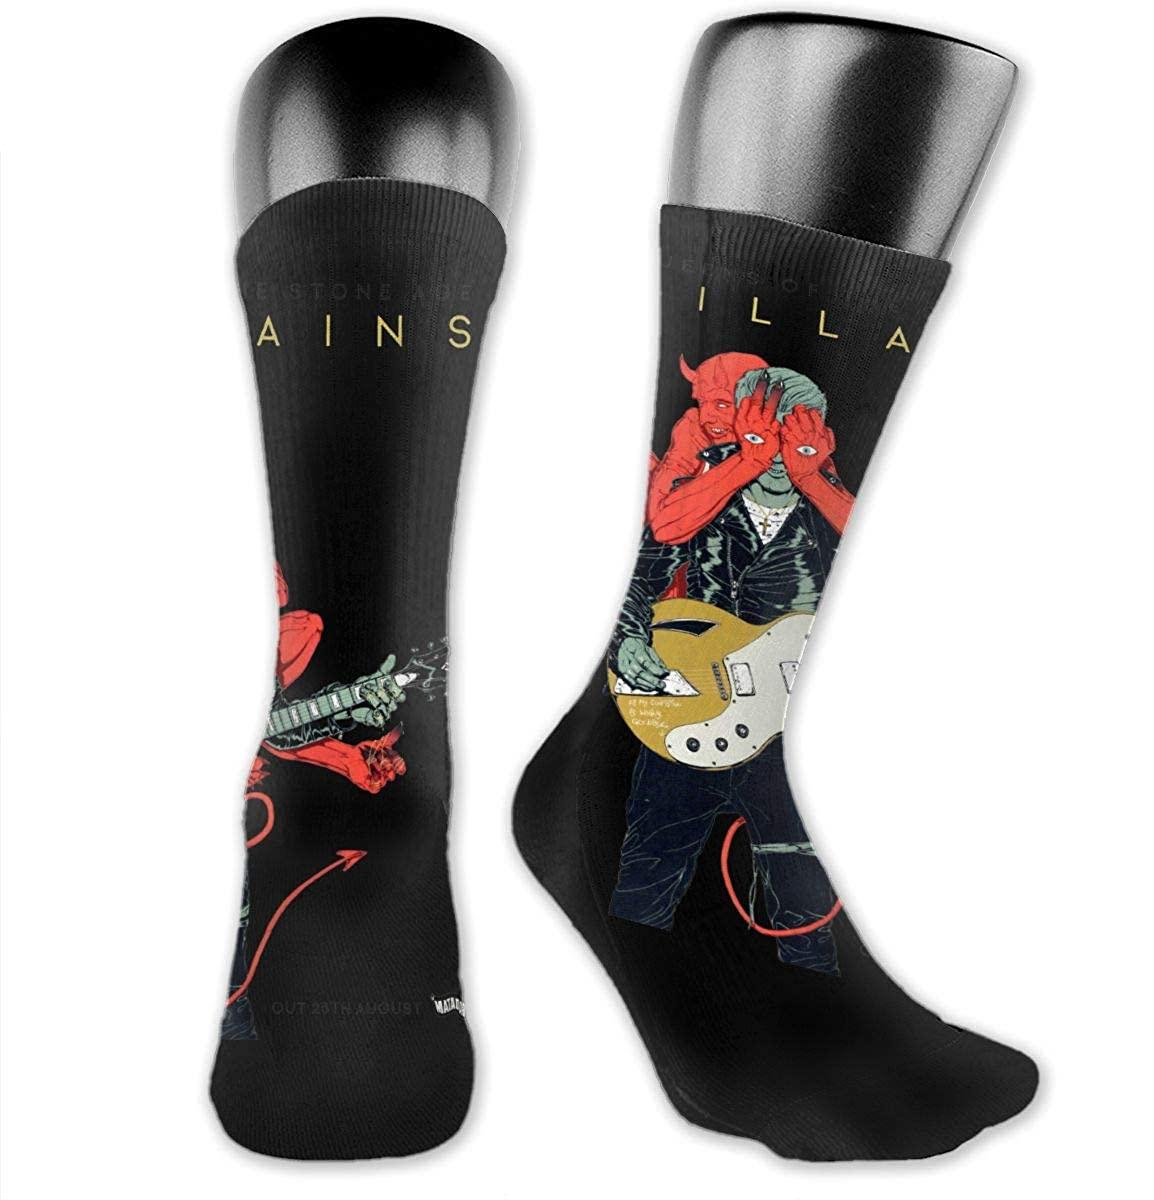 Queens Of The Stone Age Medium Long Socks Dress Hose Novelty Short Anklet For Hiking